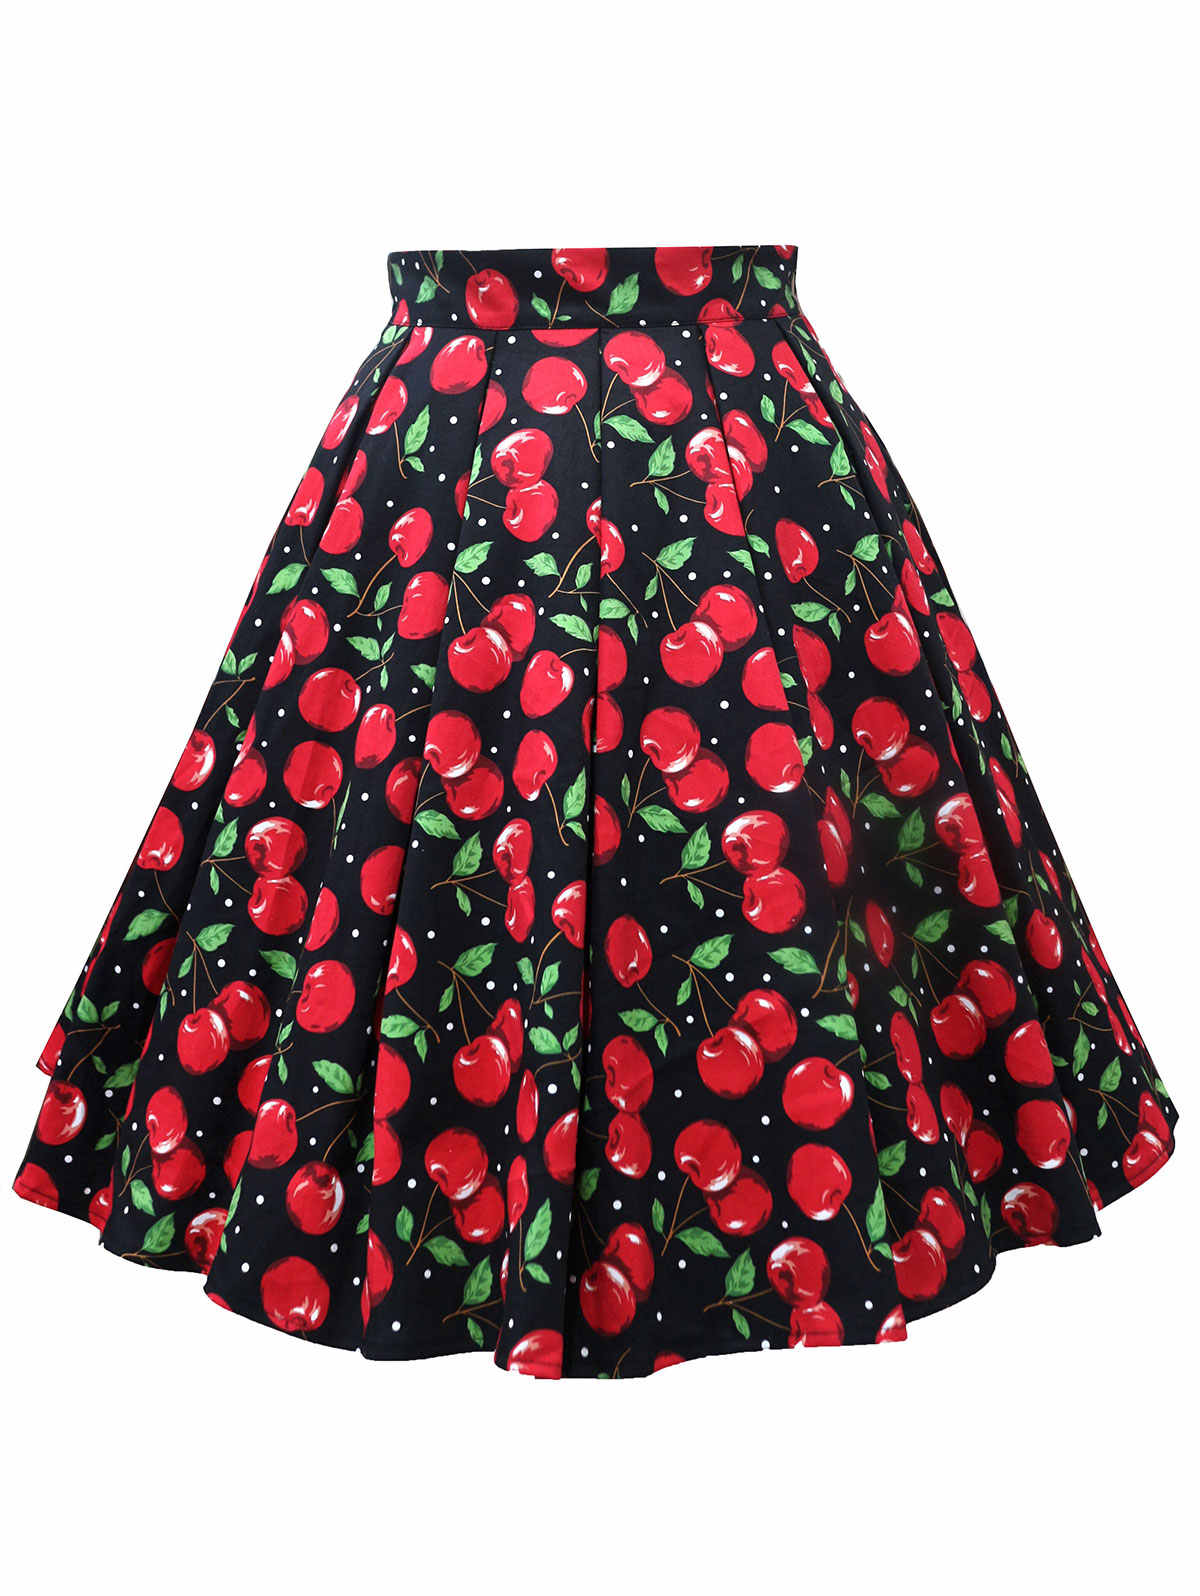 Kenancy Women Plus Size L-5XL Cherry Print Midi Skirt High Waist Vintage  Skater Faldas 99f949cd7cb1